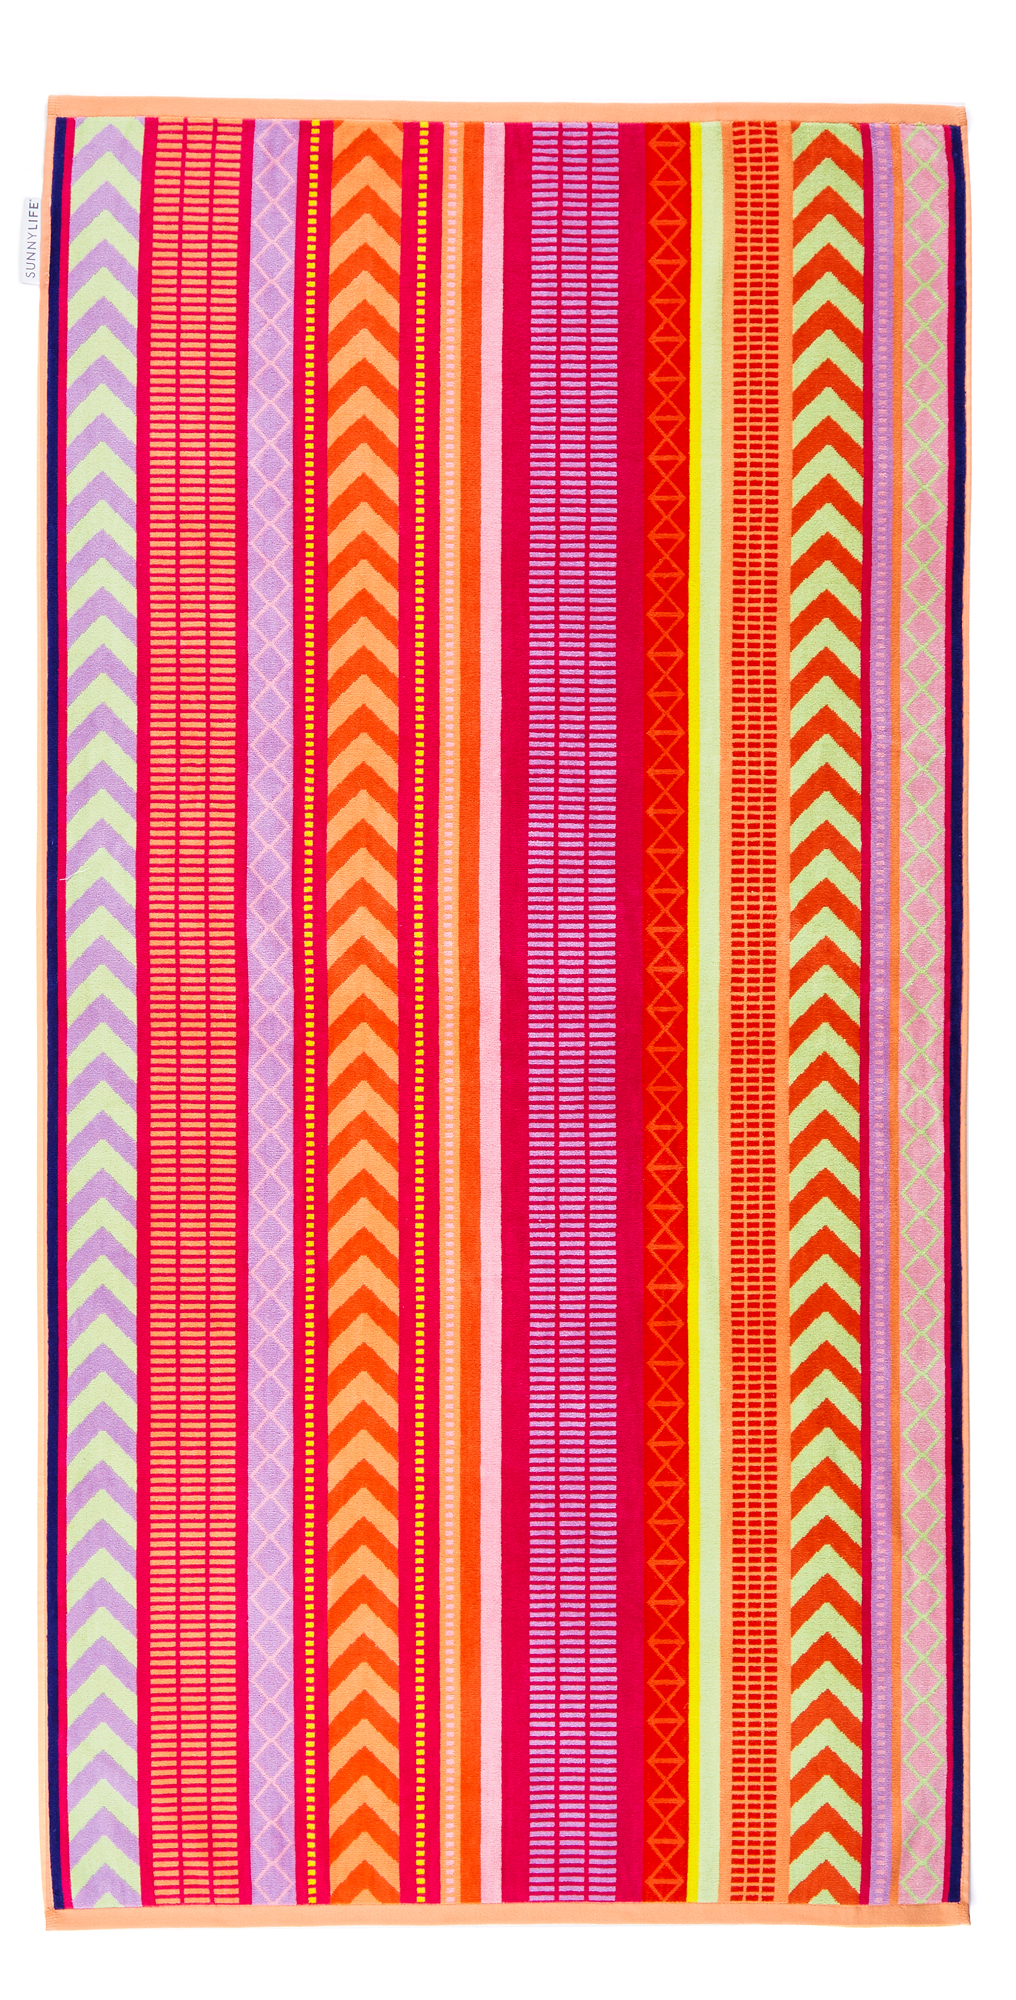 Balandra Luxe Towel SunnyLife